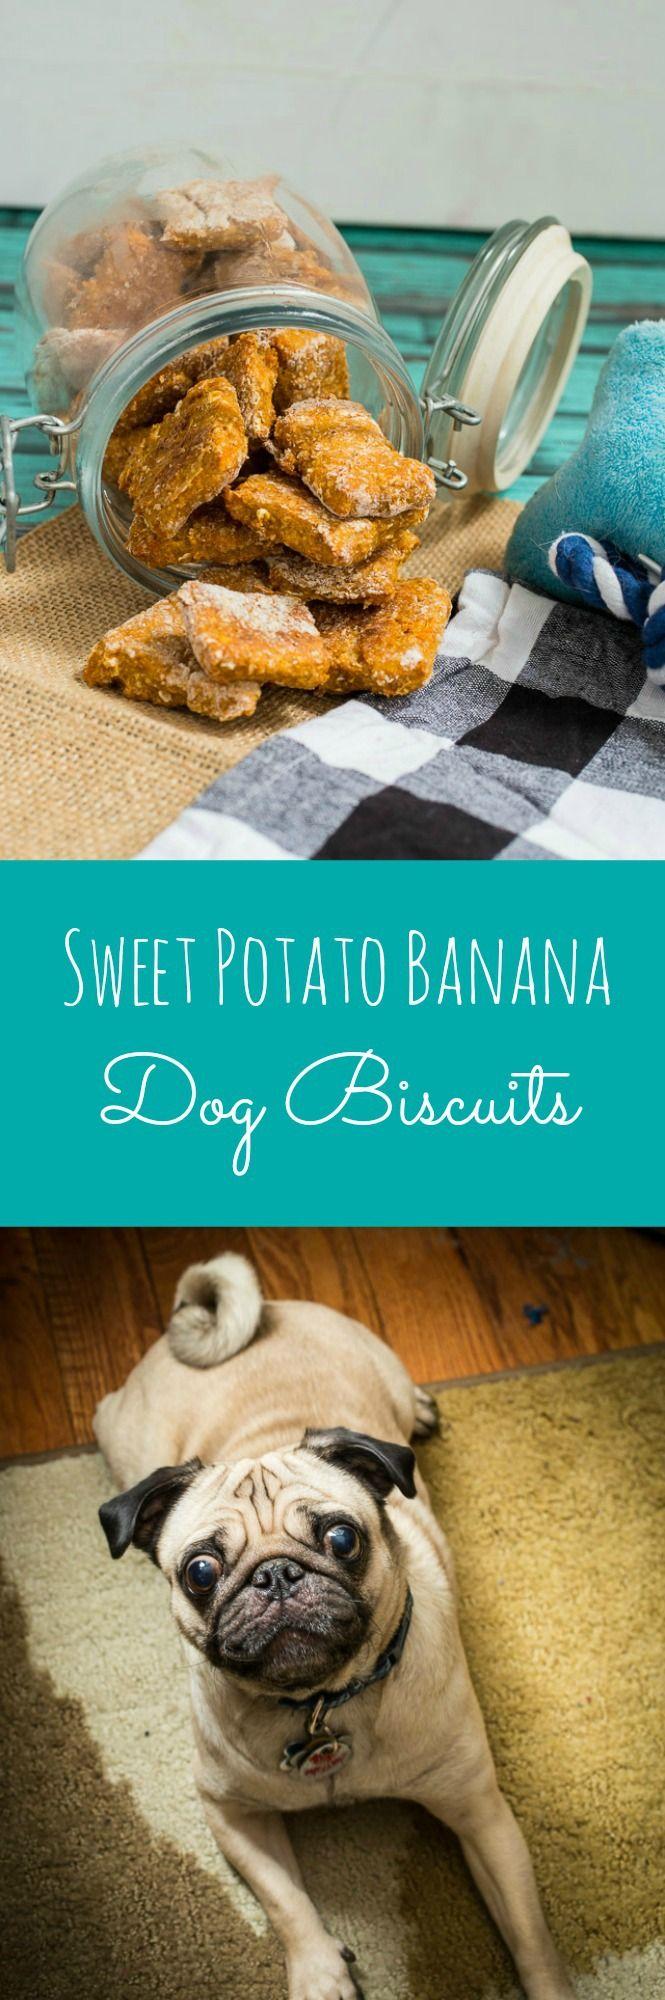 Sweet Potato Banana Dog Biscuits   girlinthelittleredkitchen.com